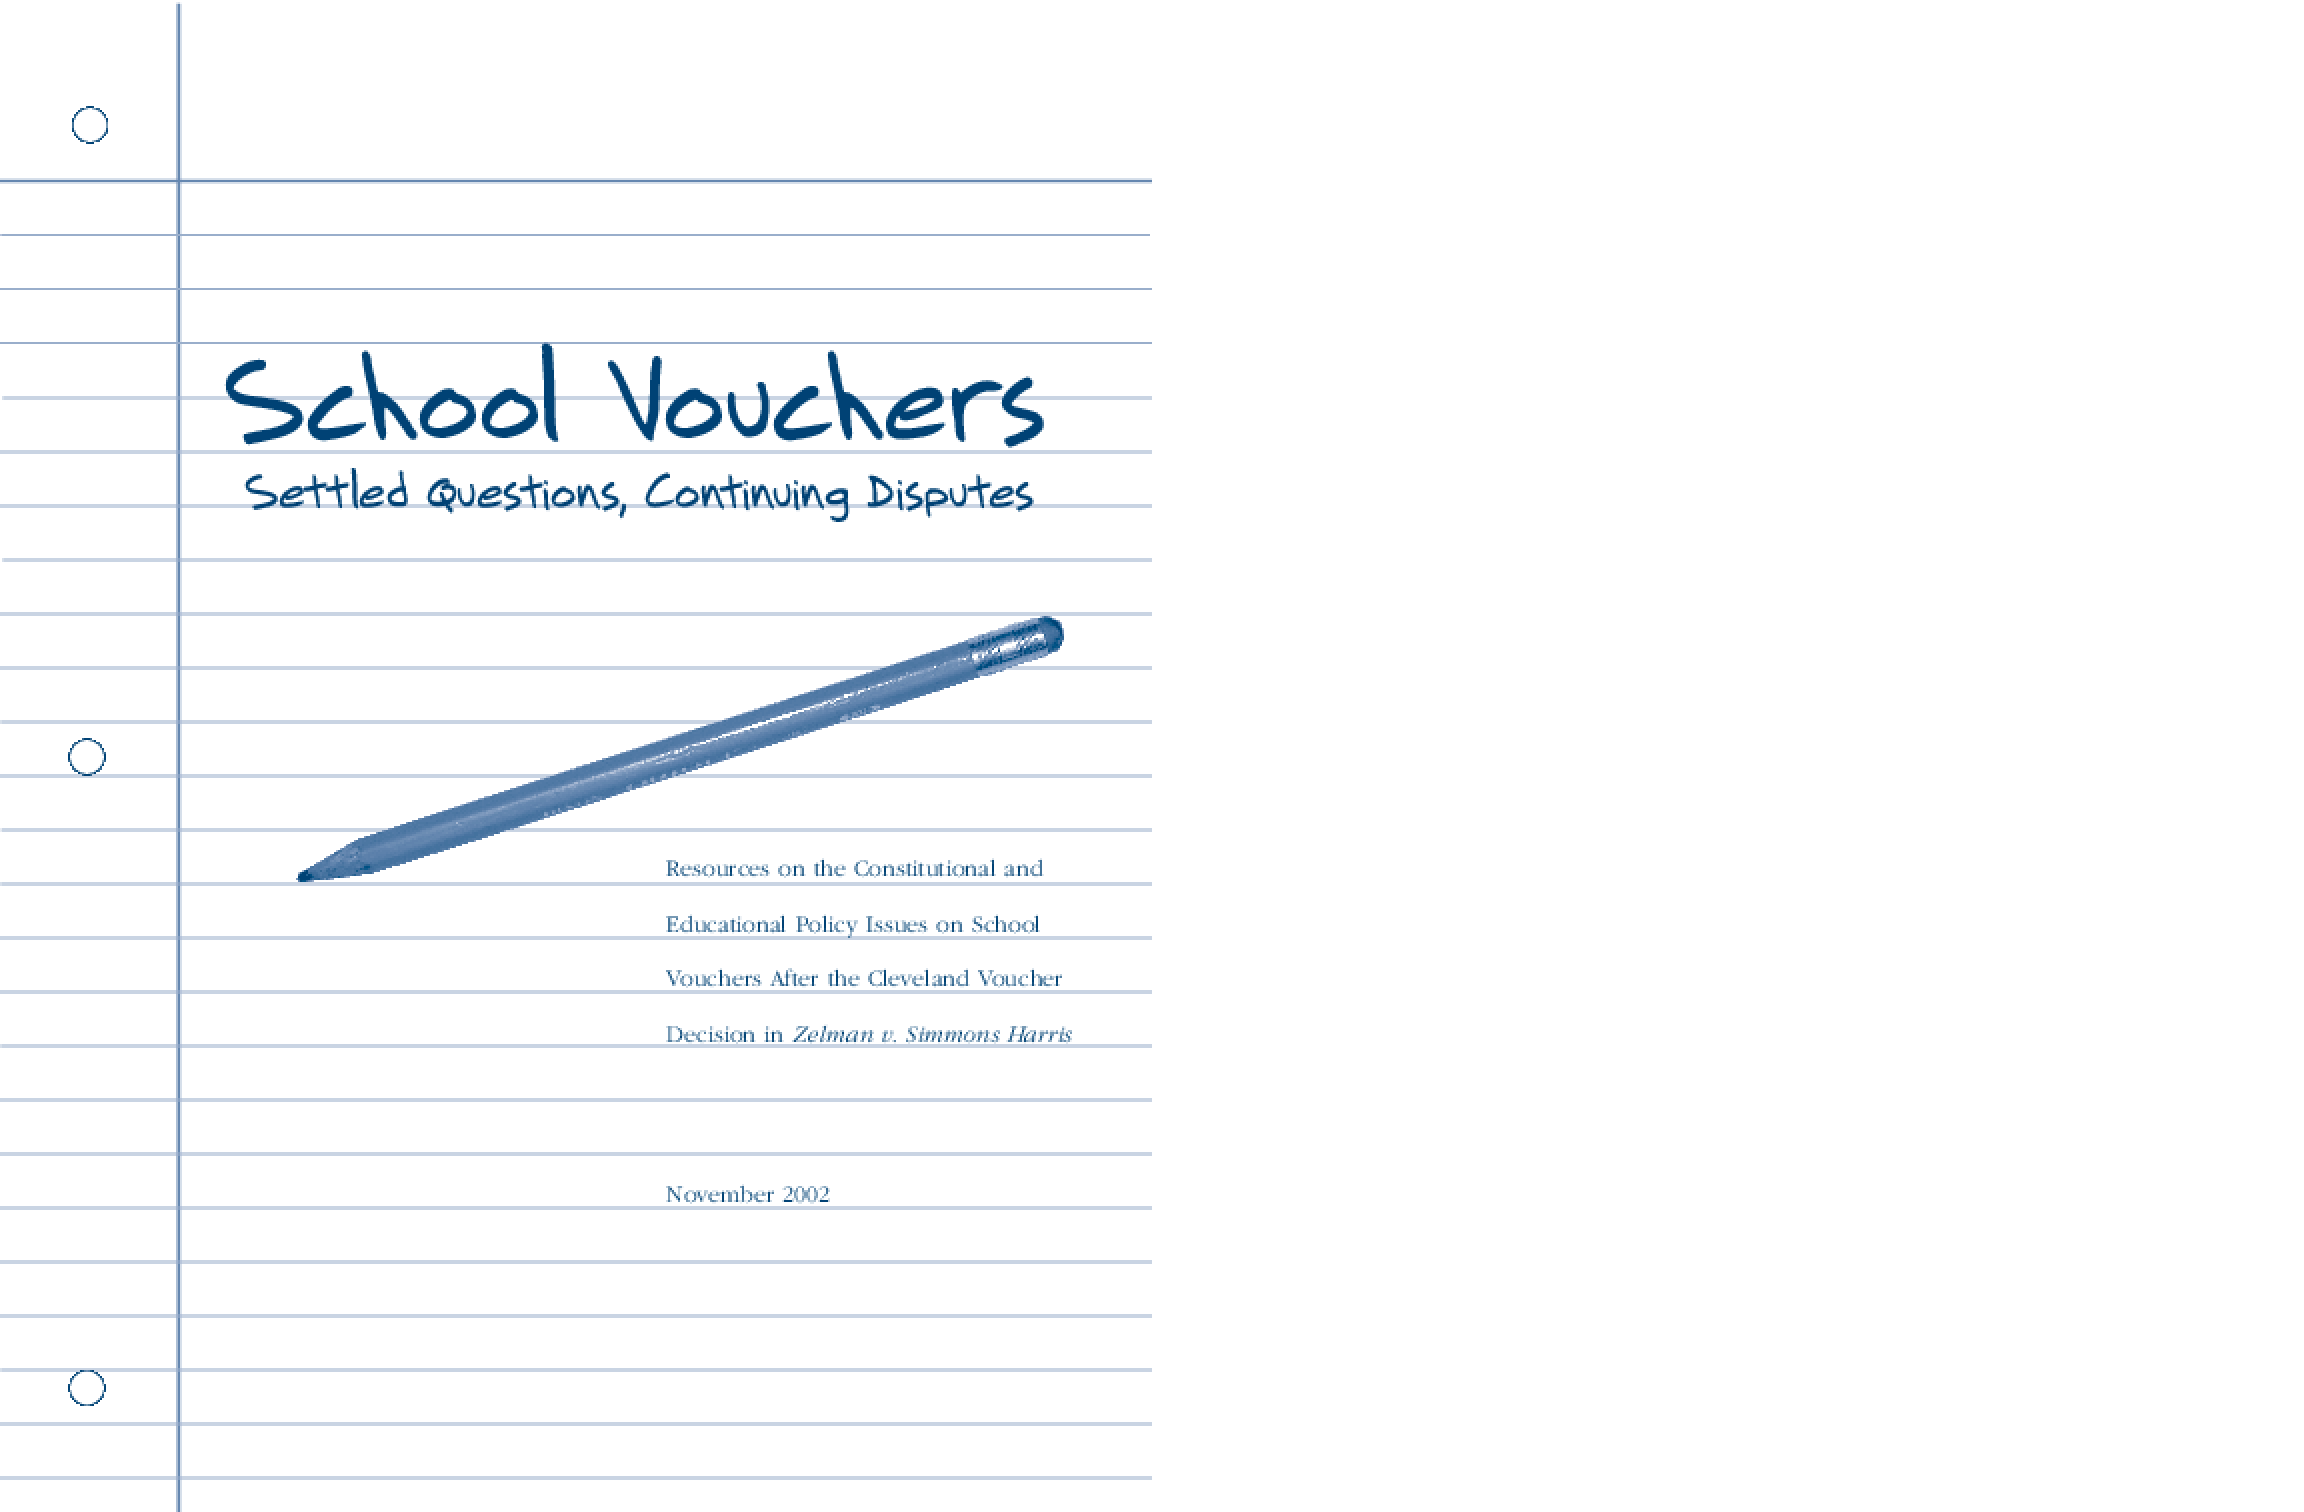 School Vouchers: Settled Questions, Continuing Disputes